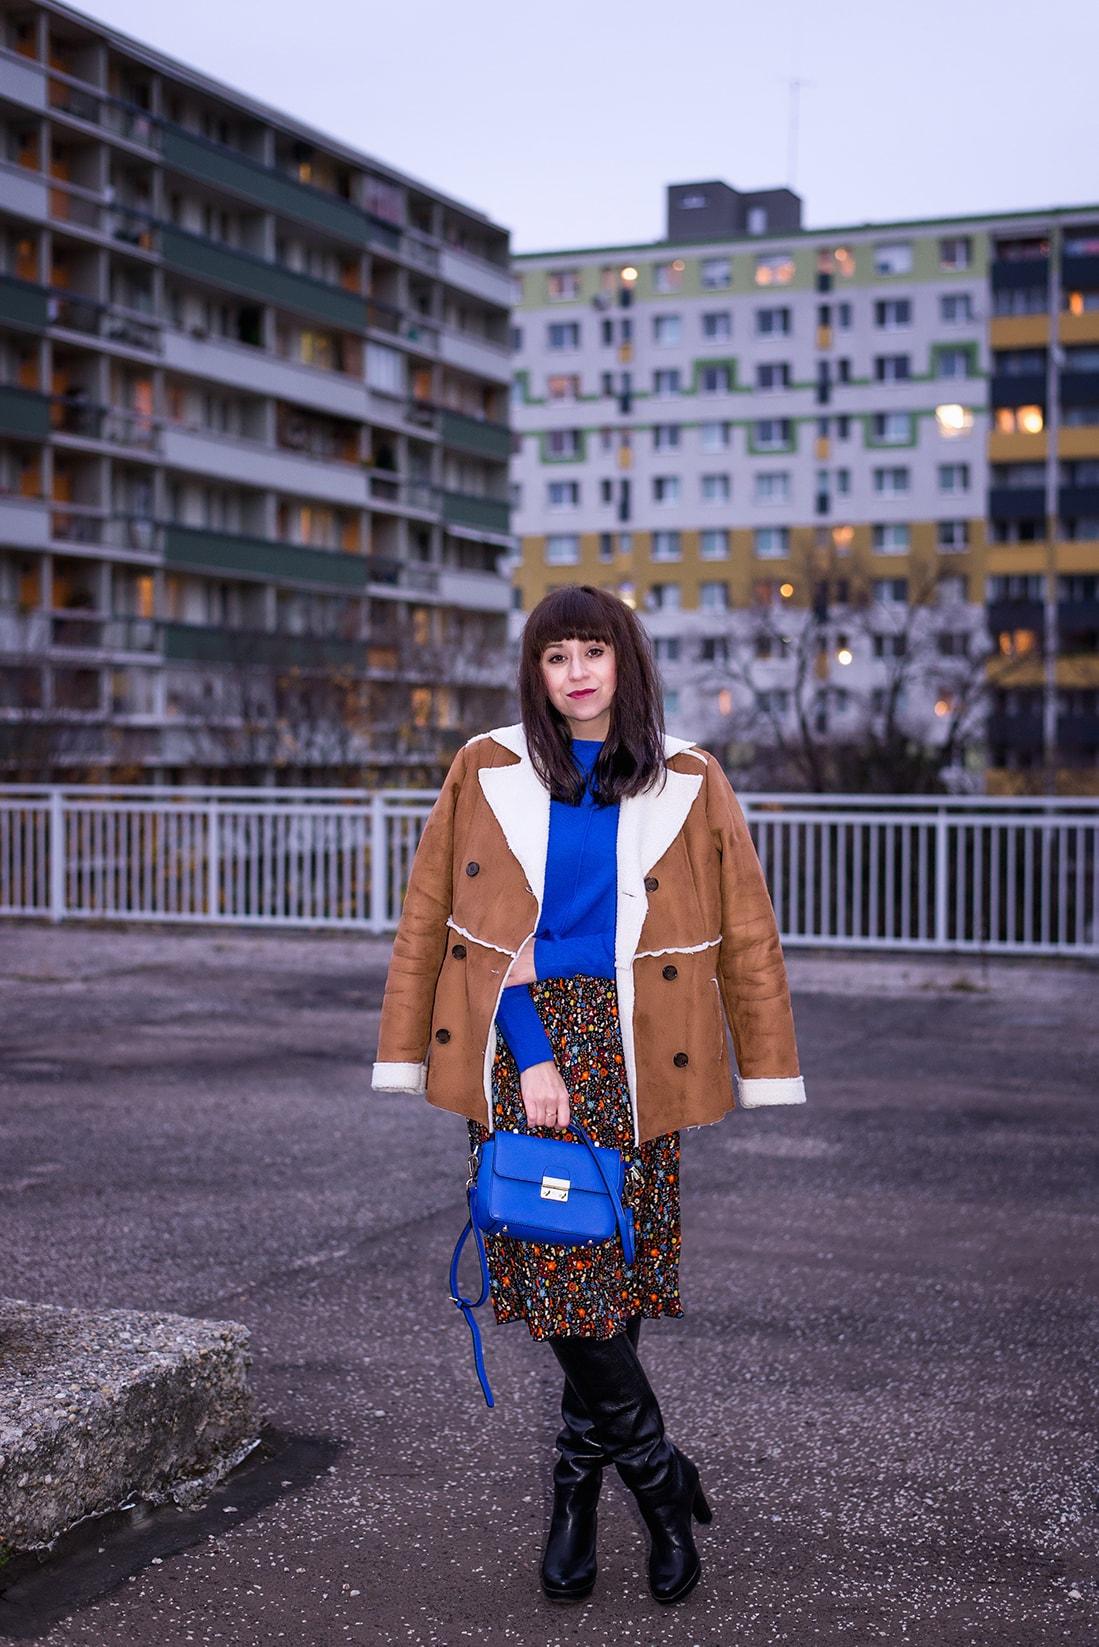 V NOWOM TARGU A SEMIŠOVÁ BUNDA NIELEN PRE BLOGERKU_Katharina-fashion is beautiful blog 18_Kvetovaná plisovaná sukňa_Kabelka JEJ_Katarína Jakubčová_Fashion blogerka